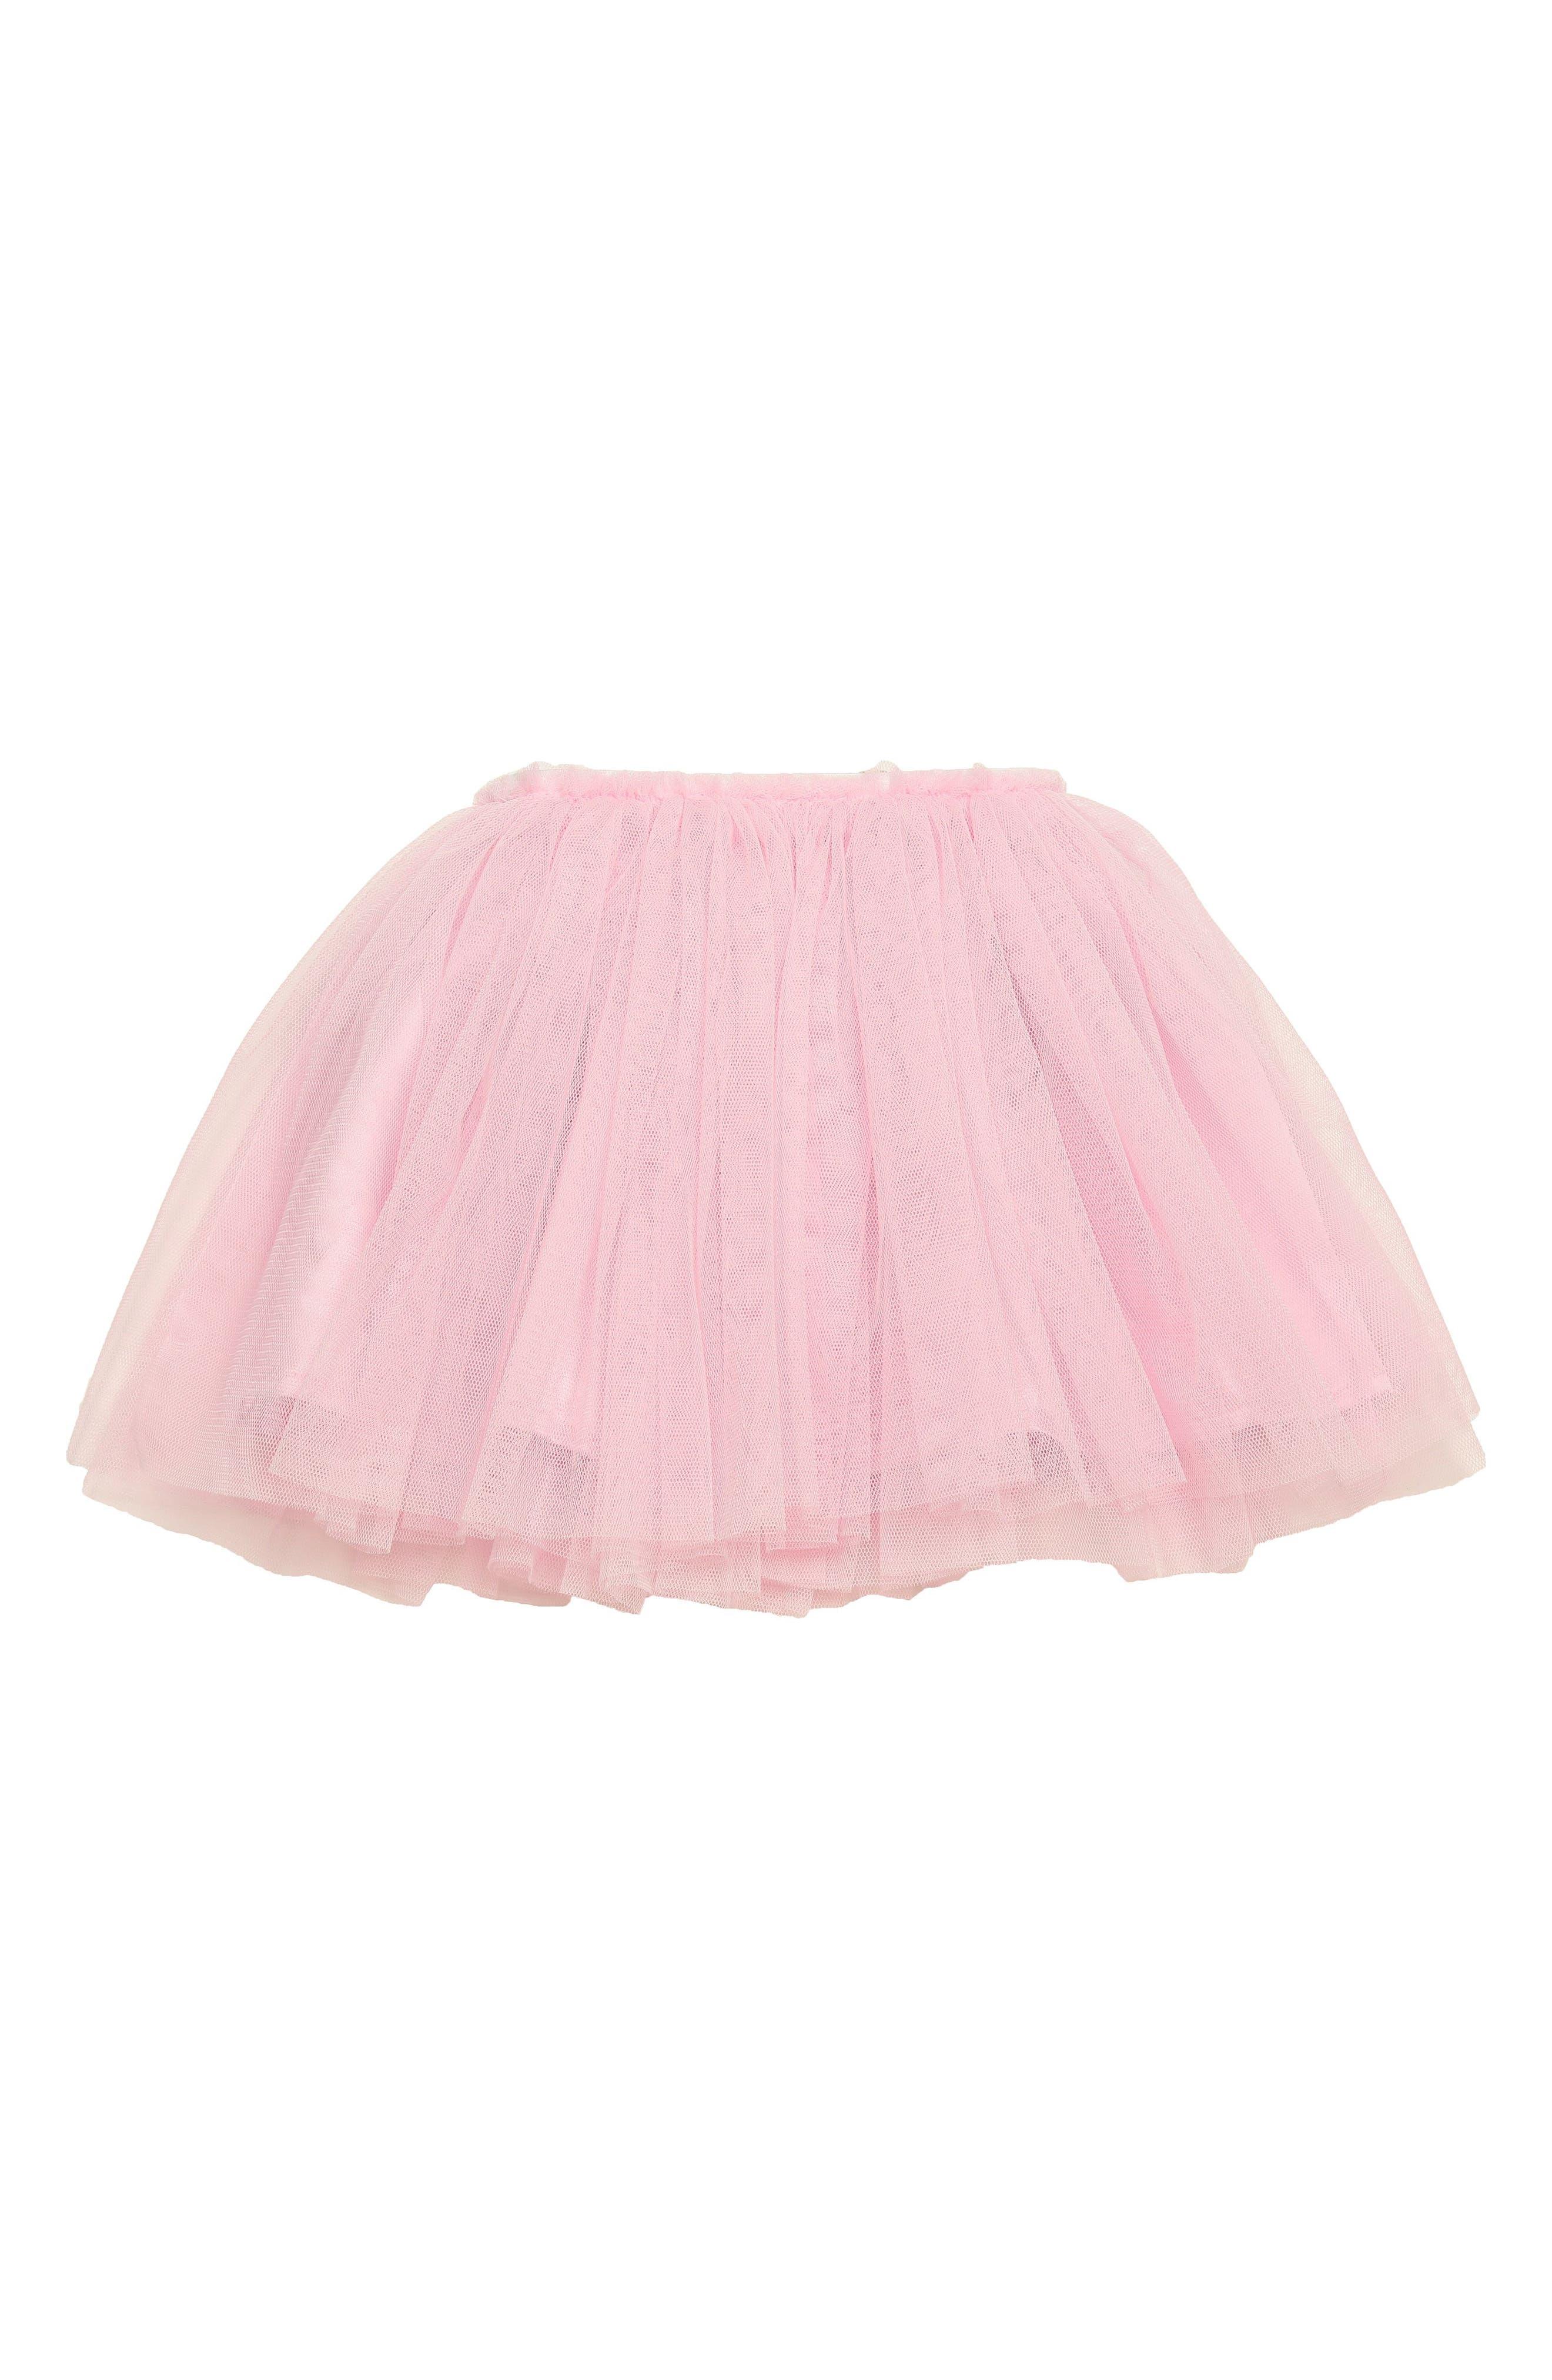 Tutu Skirt,                             Main thumbnail 1, color,                             PINK